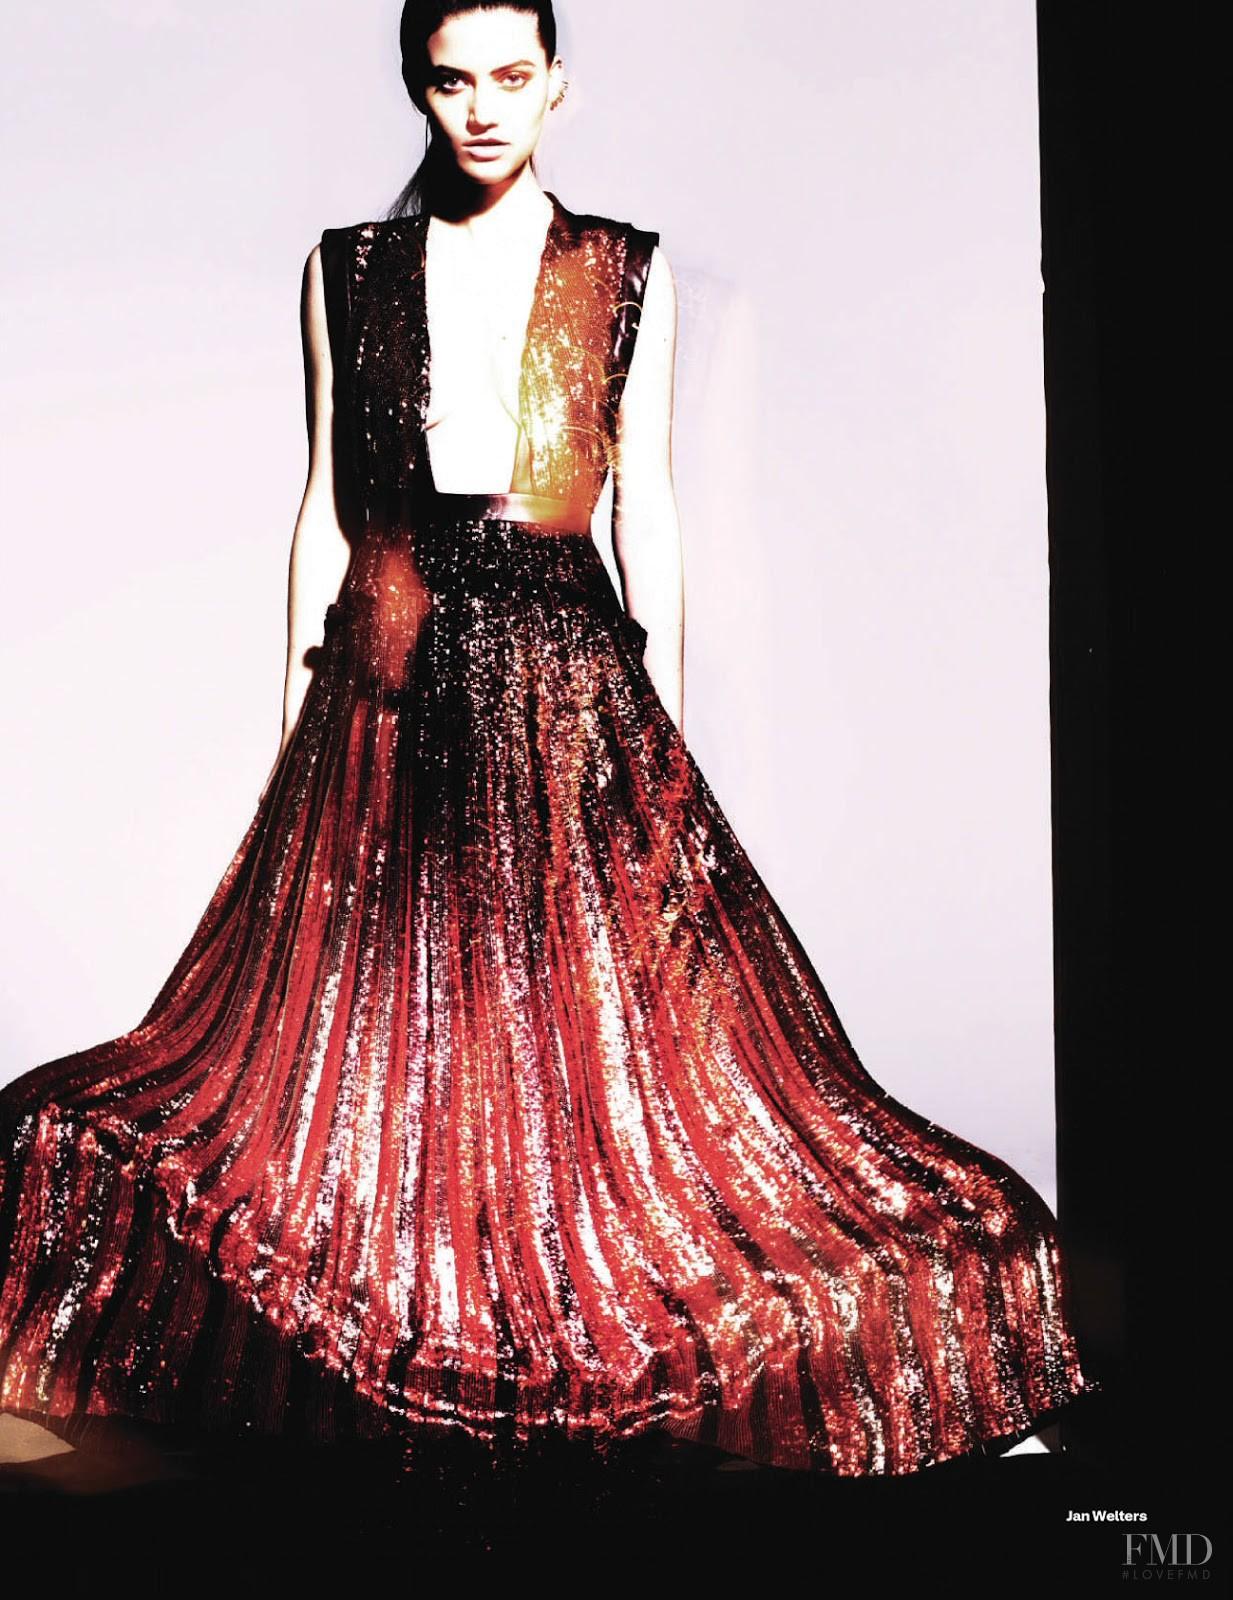 How did this Michael Kors bag spark a fashion phenomenon Kelsey gerry fashion spot